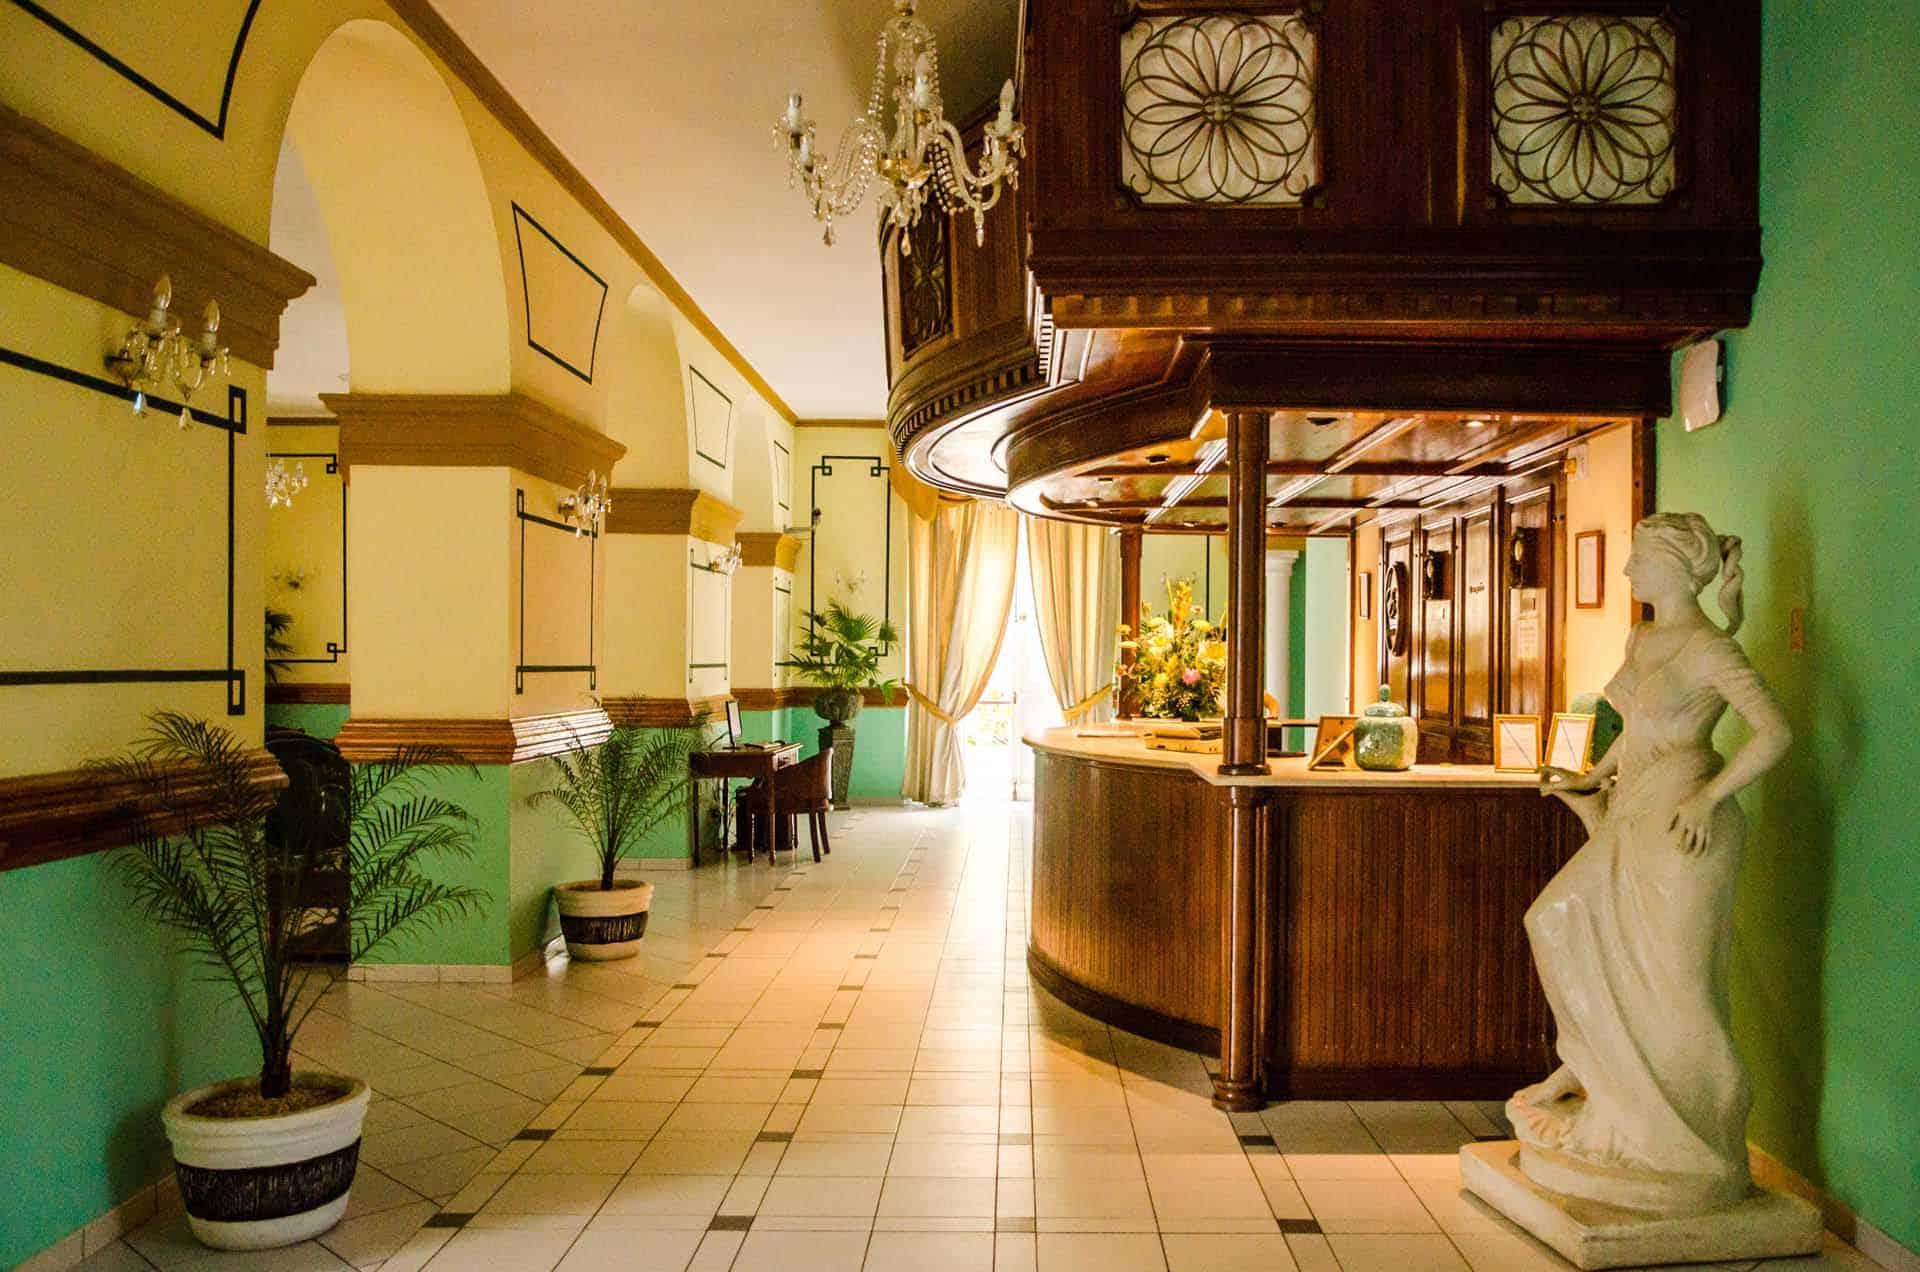 H1146 Hotel La Union Cienfuegos 06 cuba autrement